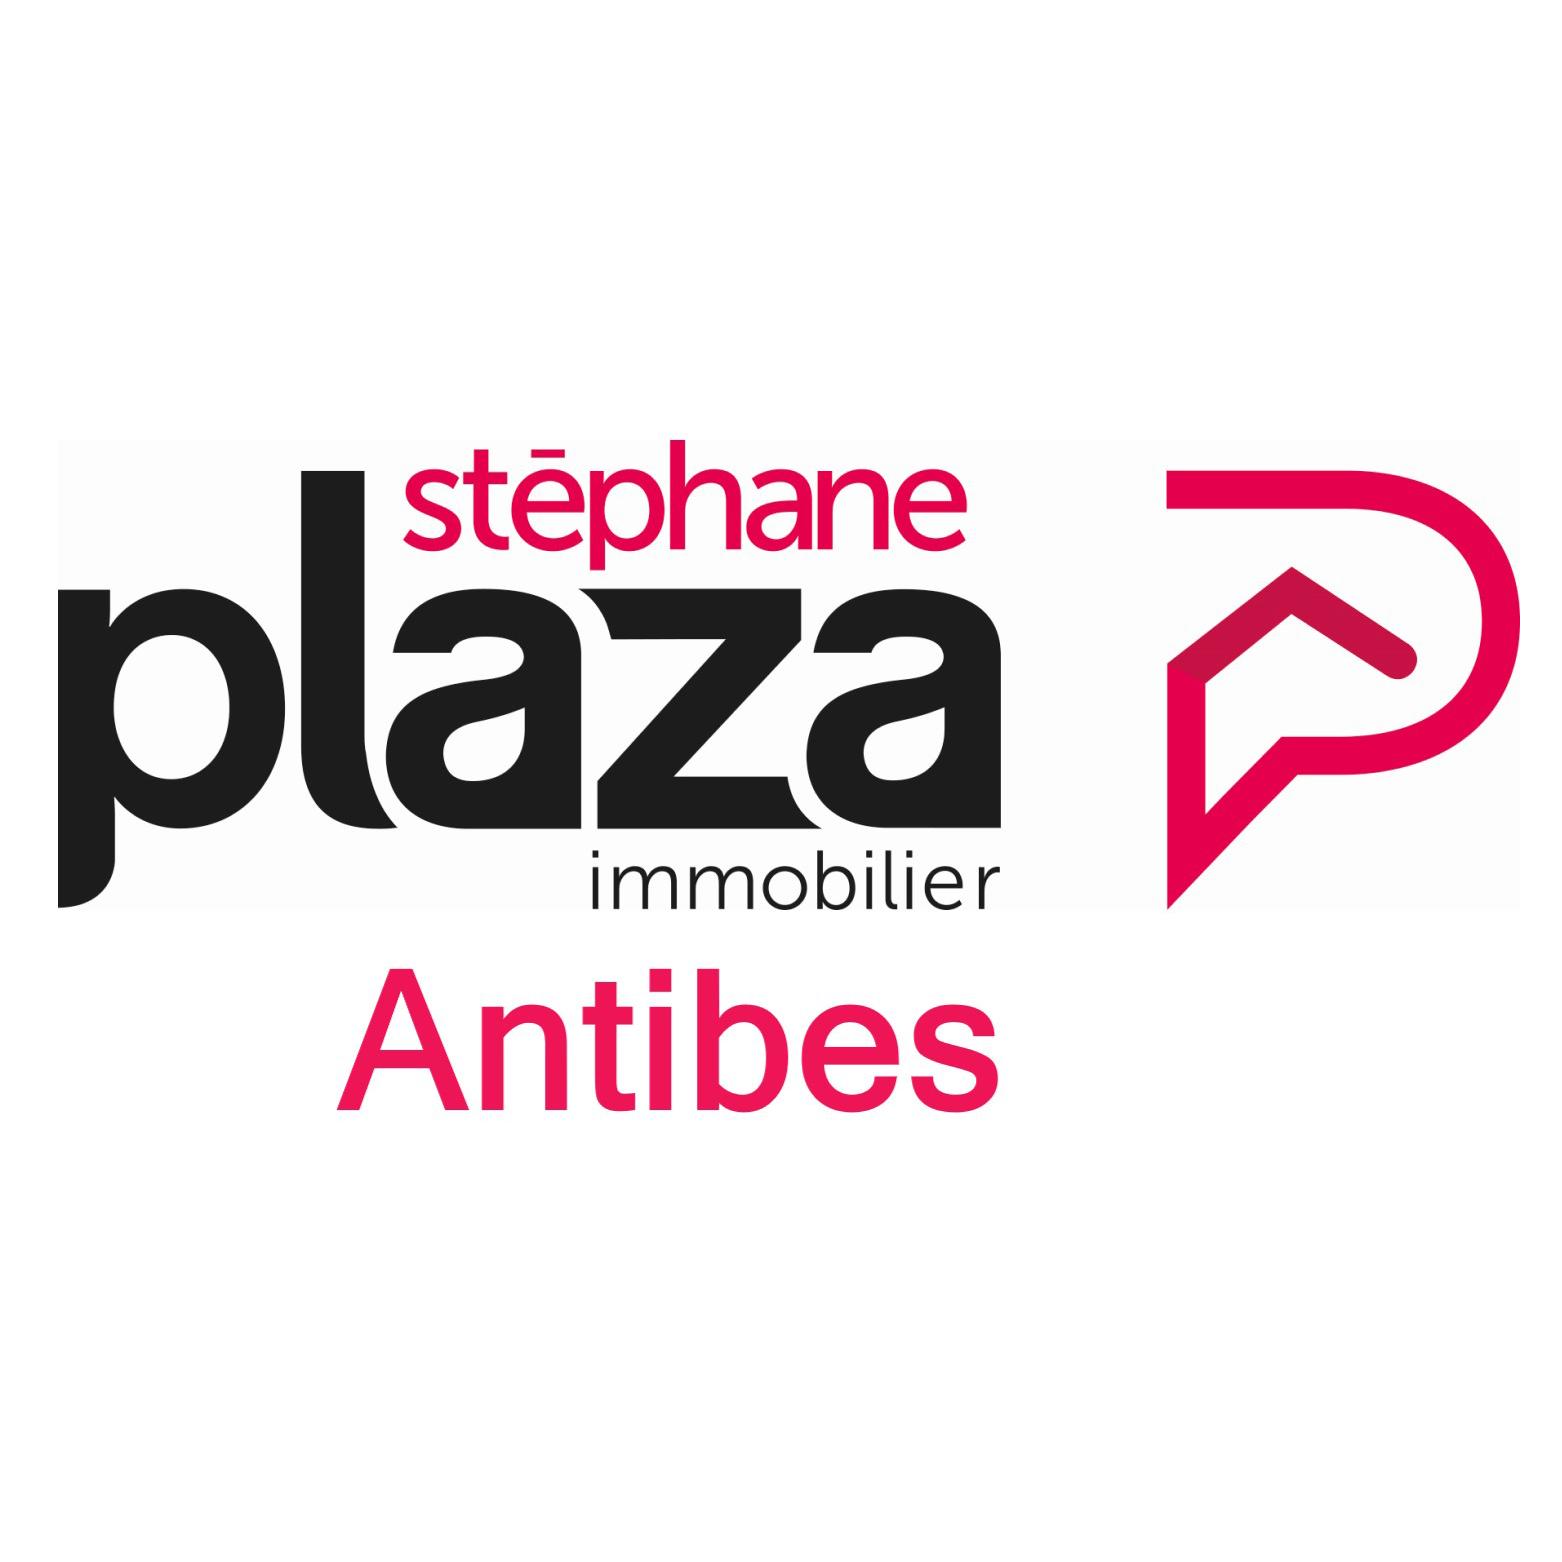 https://www.asfontonne-antibes.com/wp-content/uploads/2020/02/Plaza_Immo_antibes.jpg